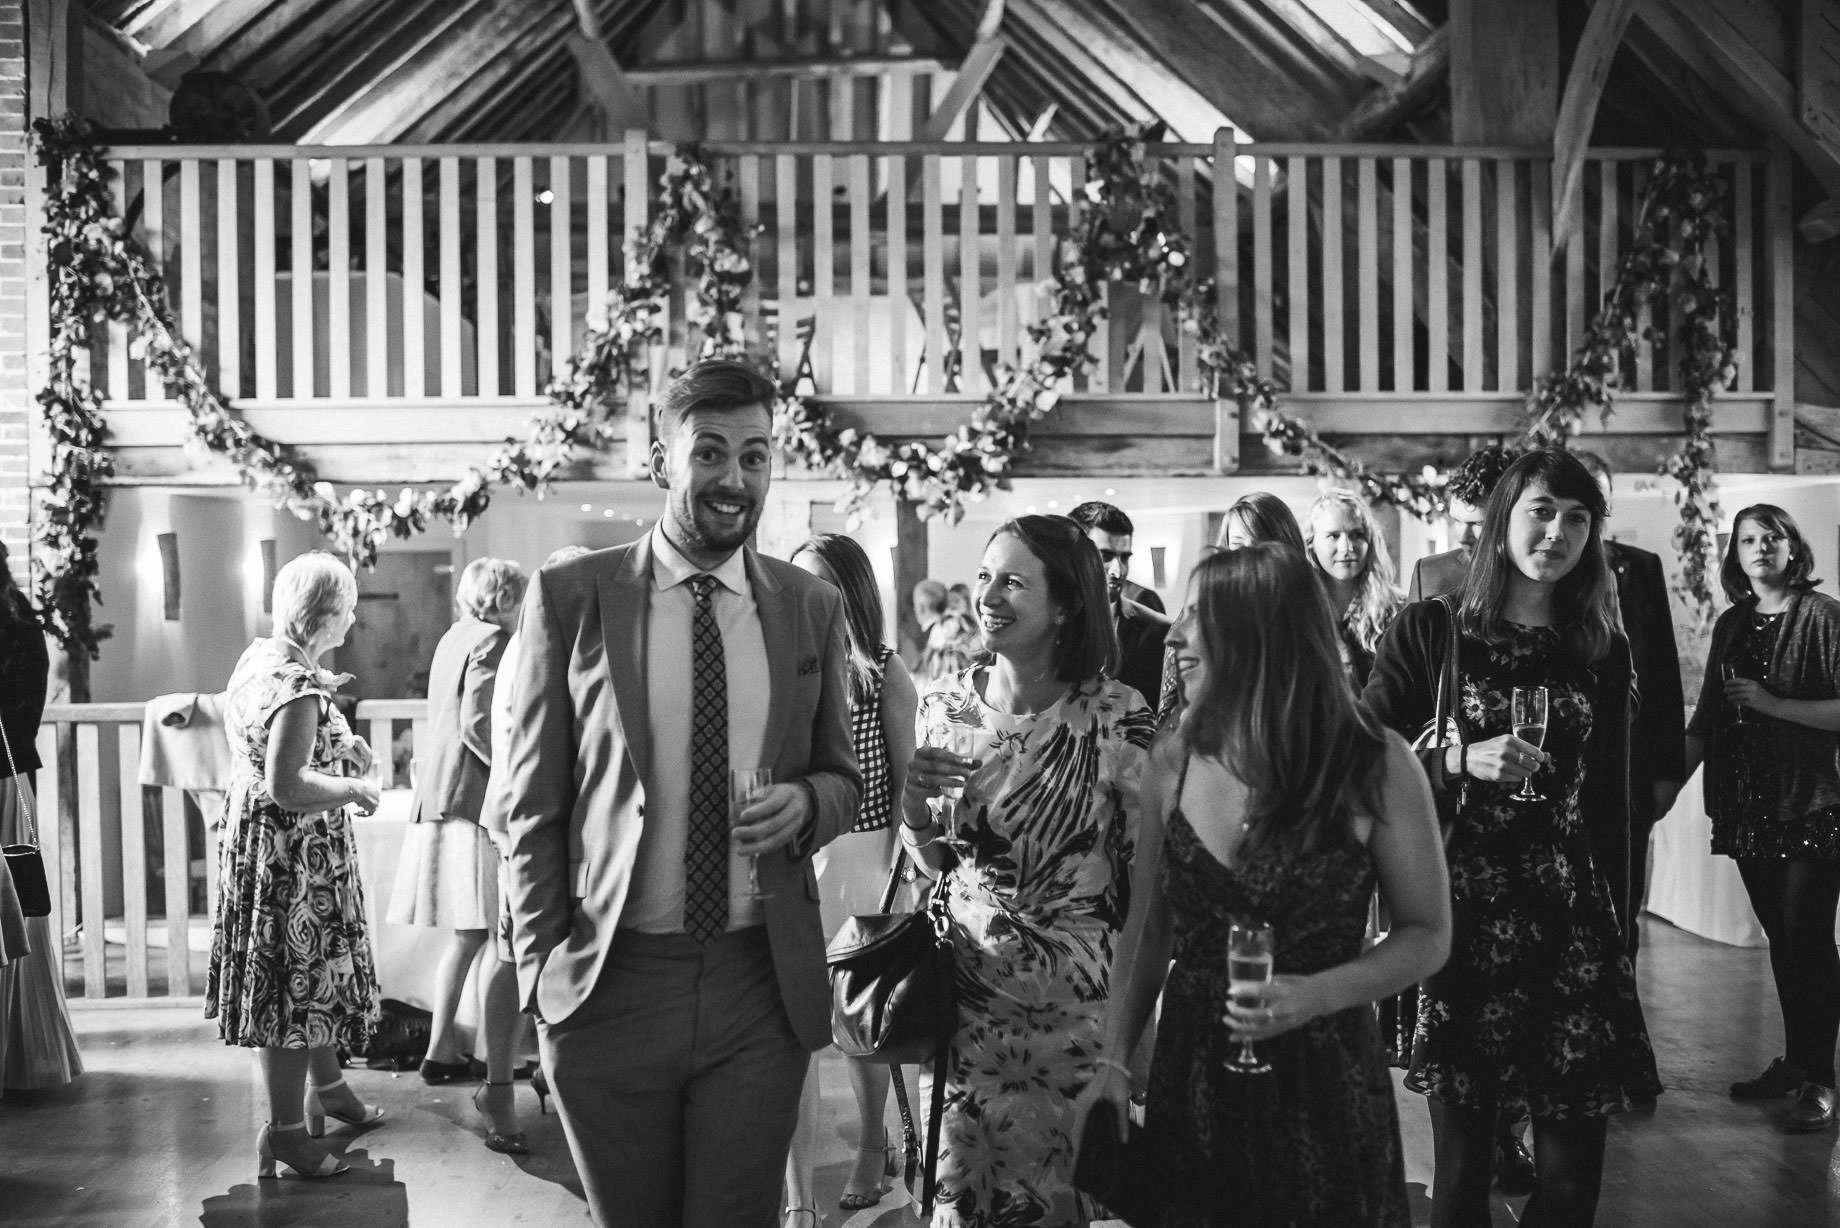 bury-court-barn-wedding-photography-guy-collier-photography-nadia-tom-133-of-184